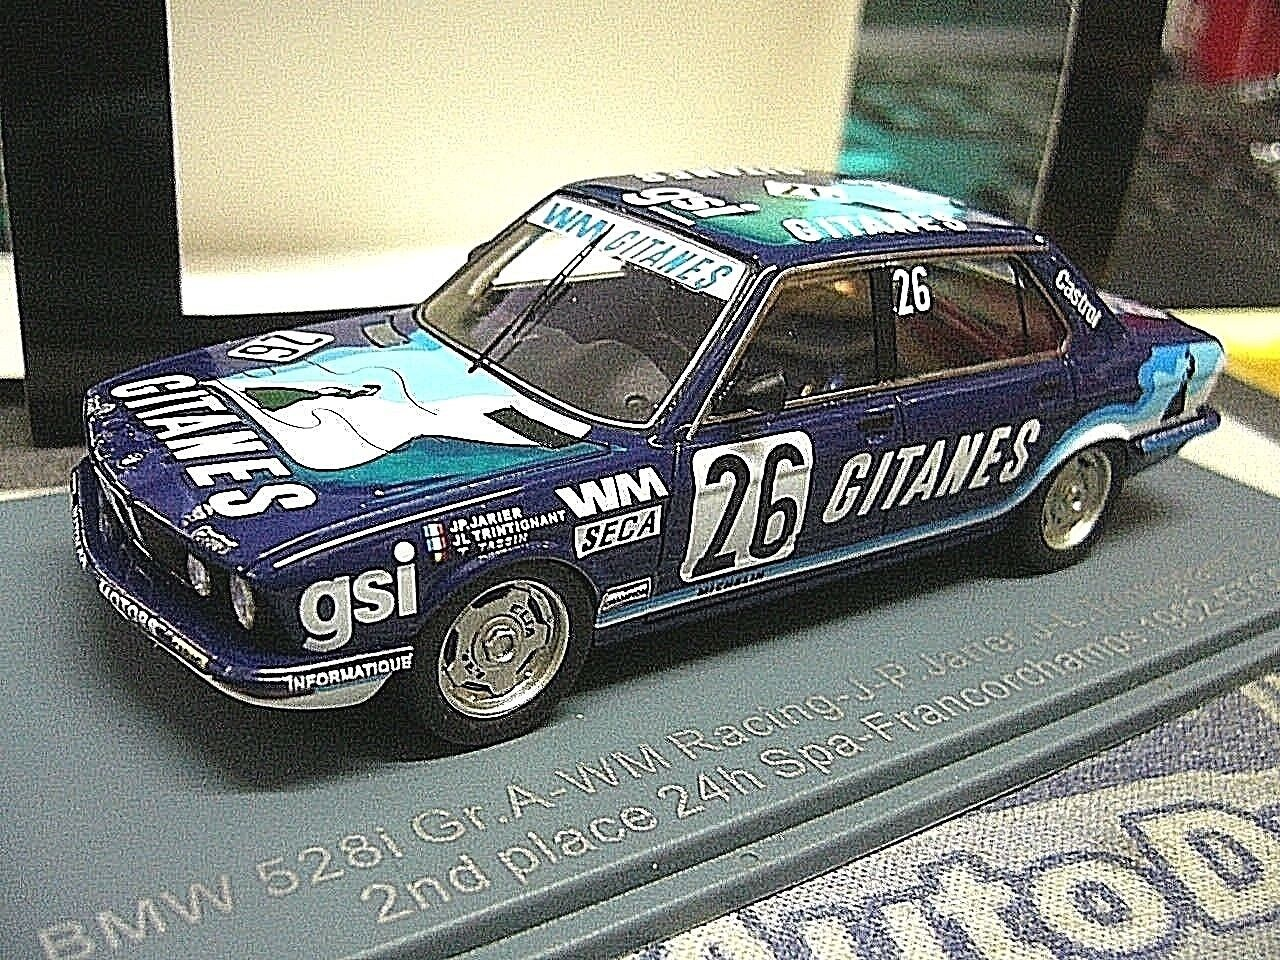 BMW 5er e28 528i 24 H Spa 1982    26 GITANE S ETCC Jarier TASSIN NEO Resin SP 1 43 86575c